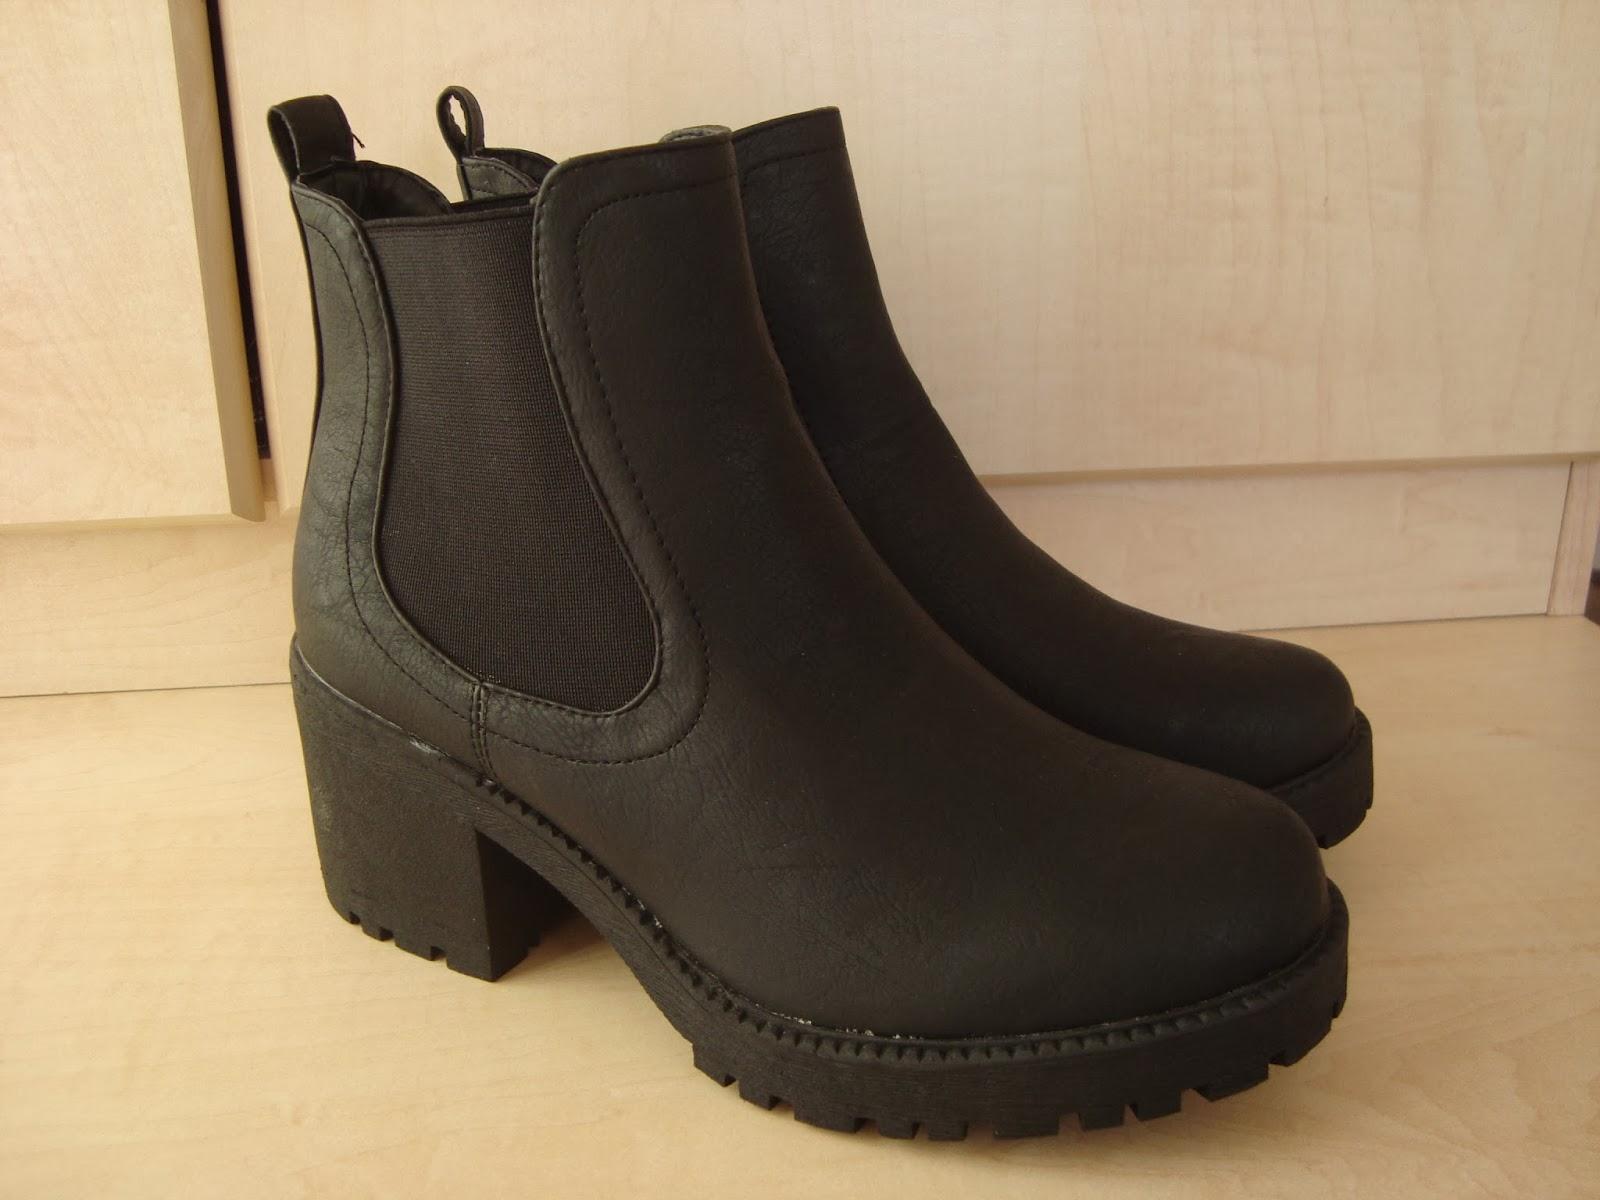 Klobige Chelsea Boots